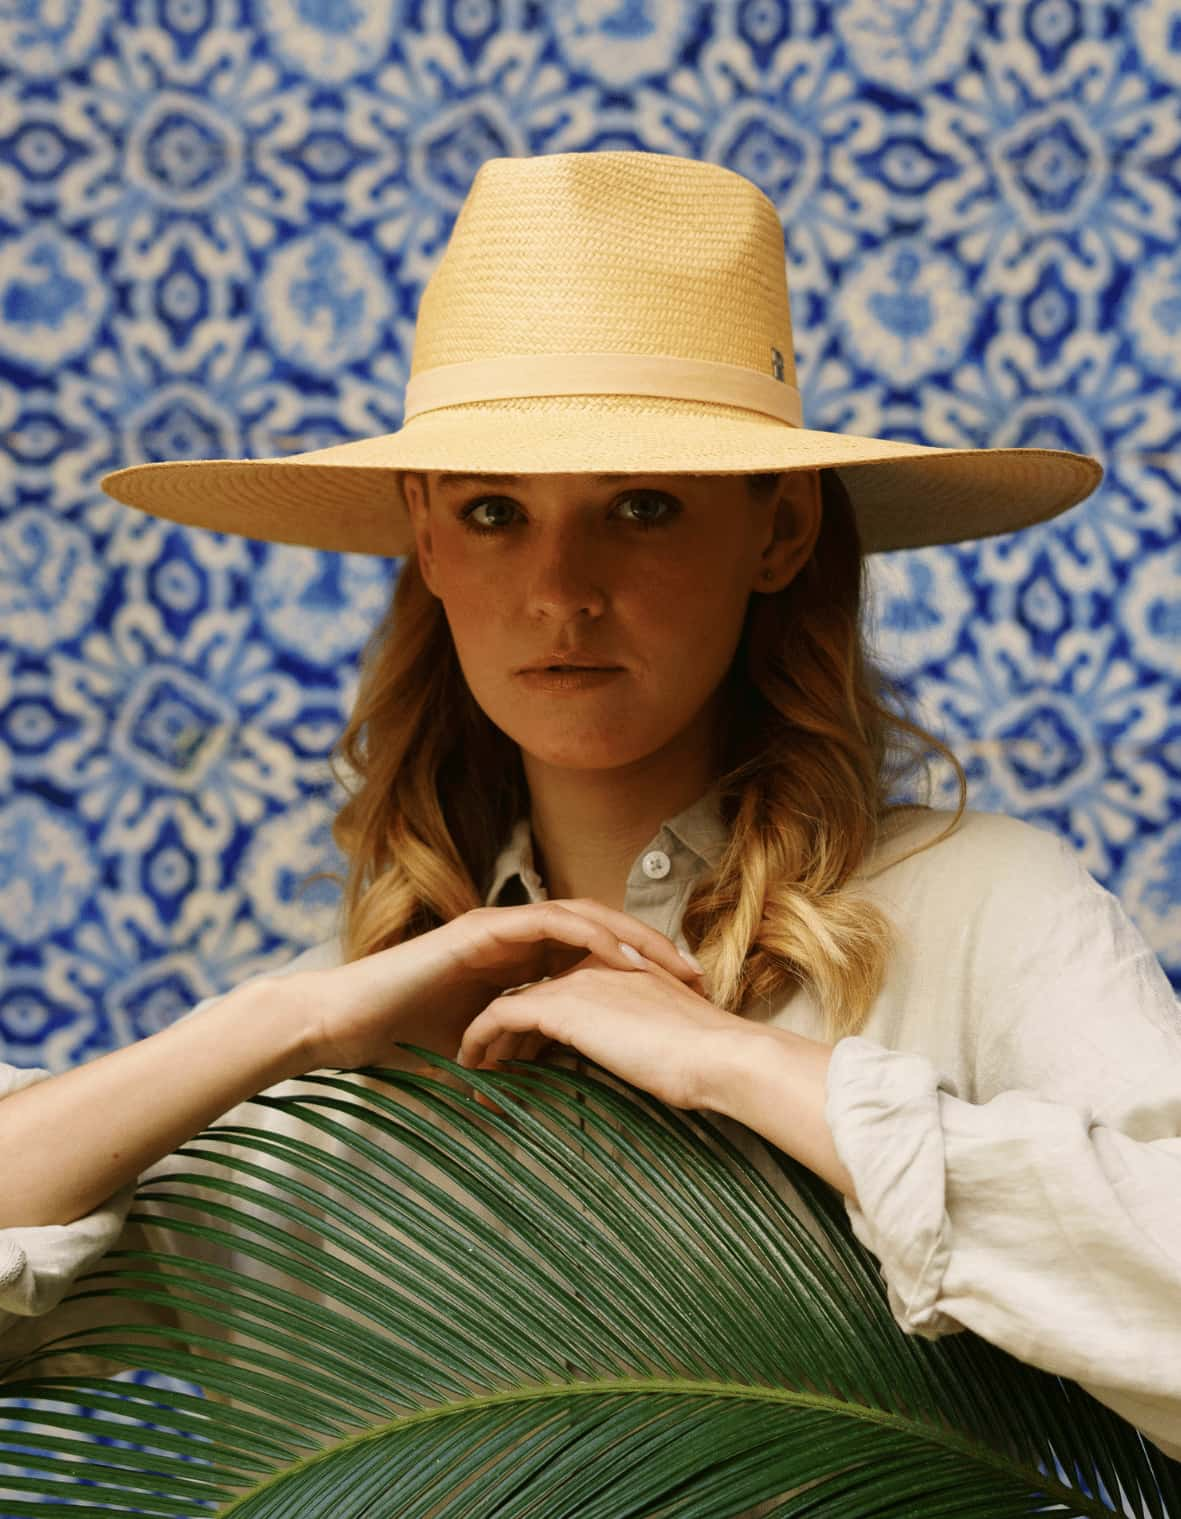 Corfu Panama Hat for Summer